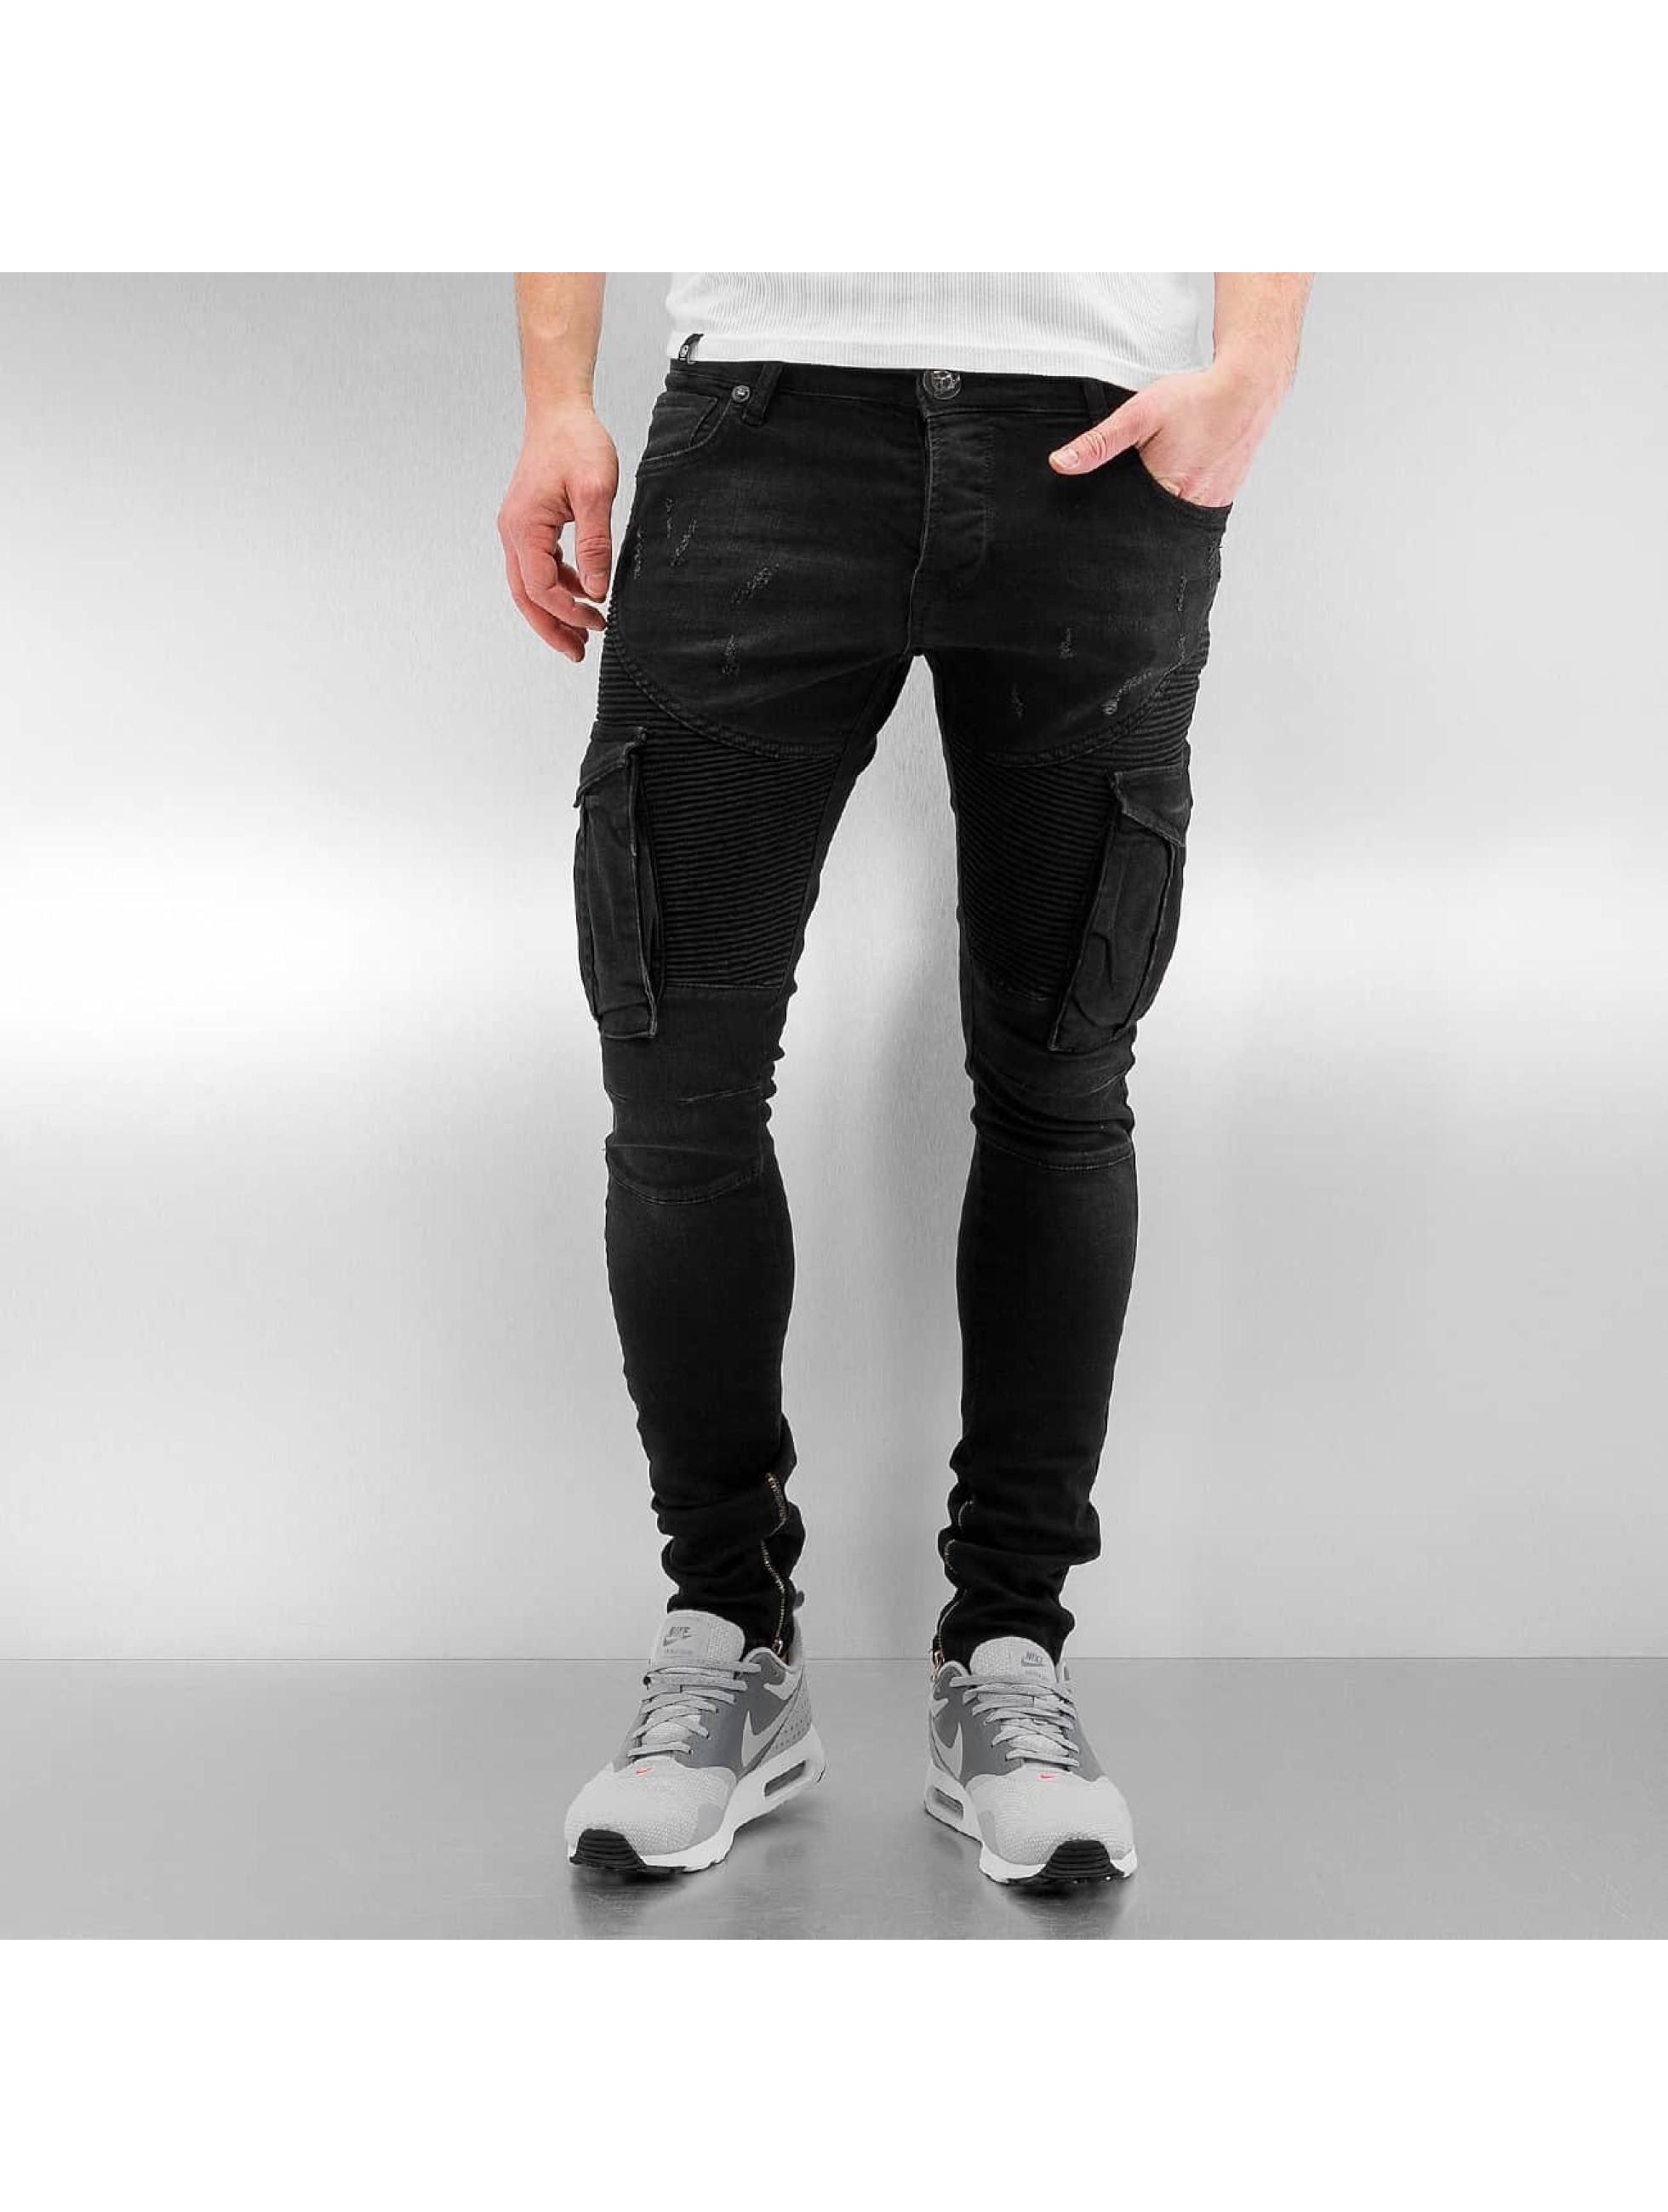 Skinny Jeans Cargo in schwarz